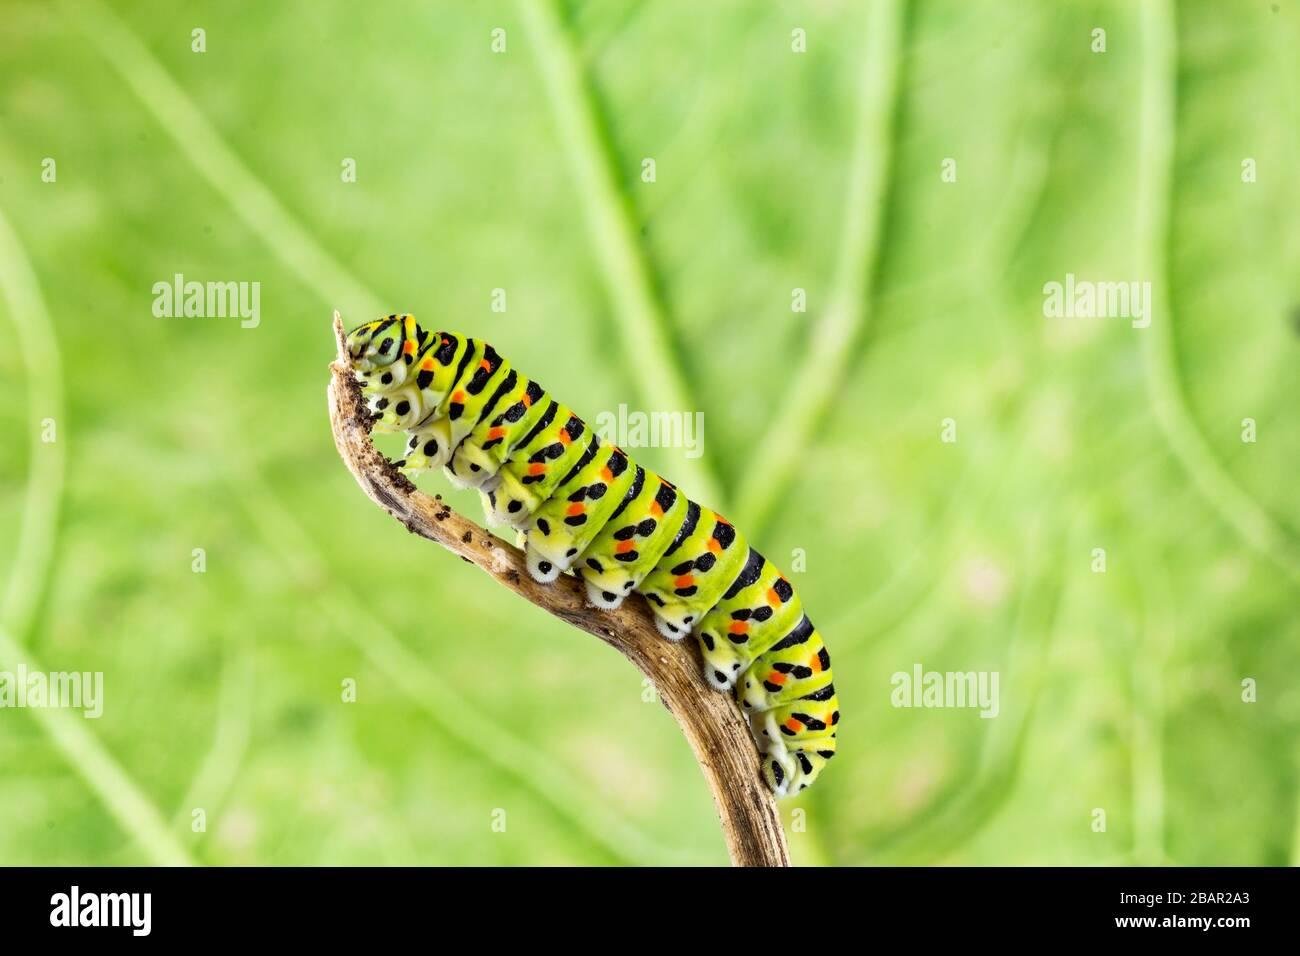 common yellow swallowtail (Papilio machaon) caterpillar closeup Stock Photo